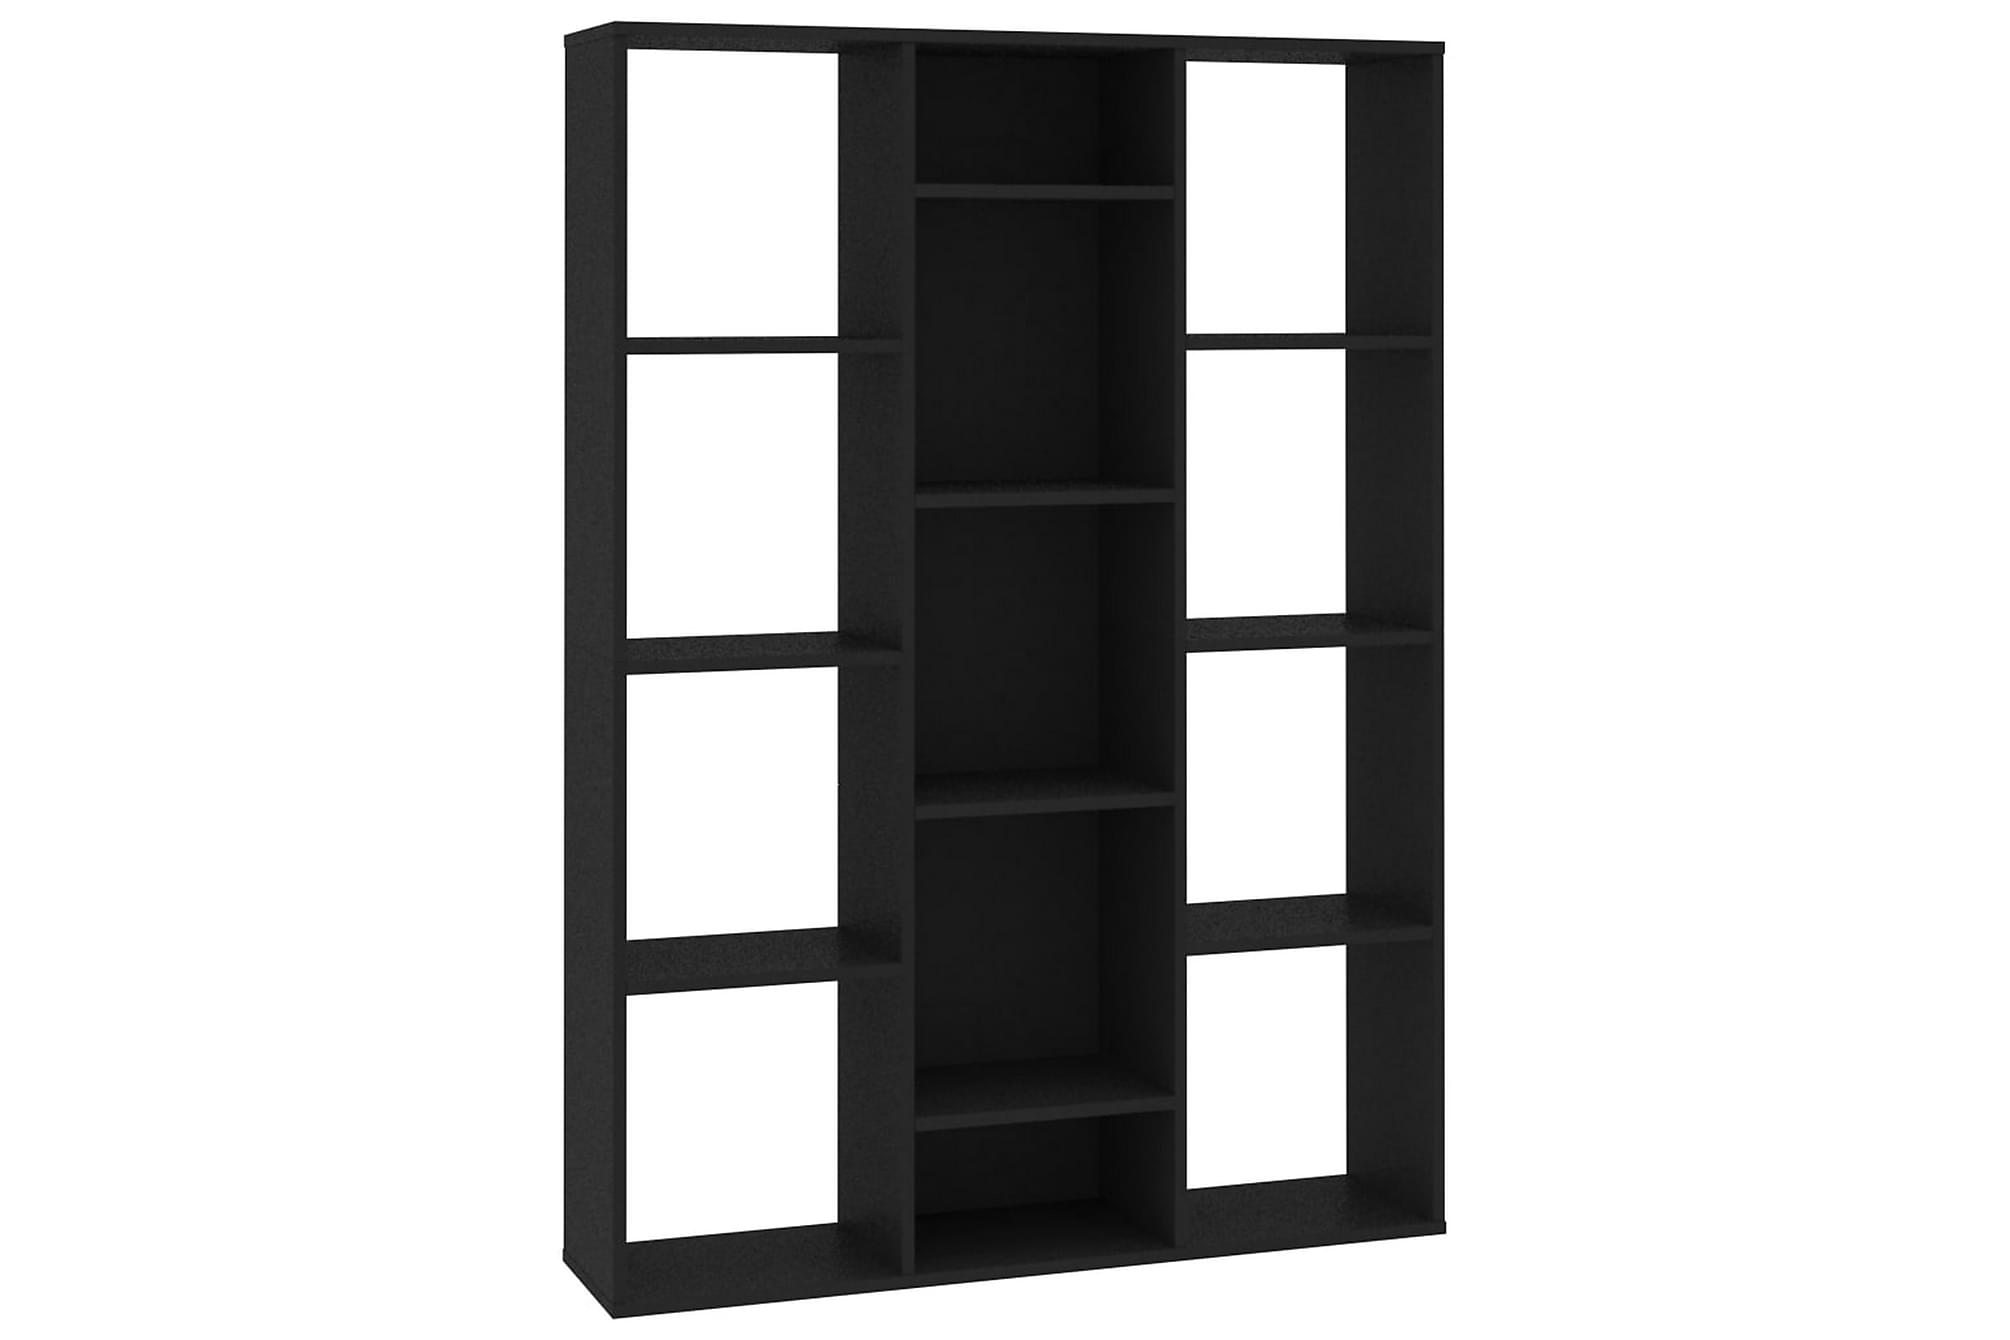 Rumsavdelare/bokhylla svart 100x24x140 cm spånskiva